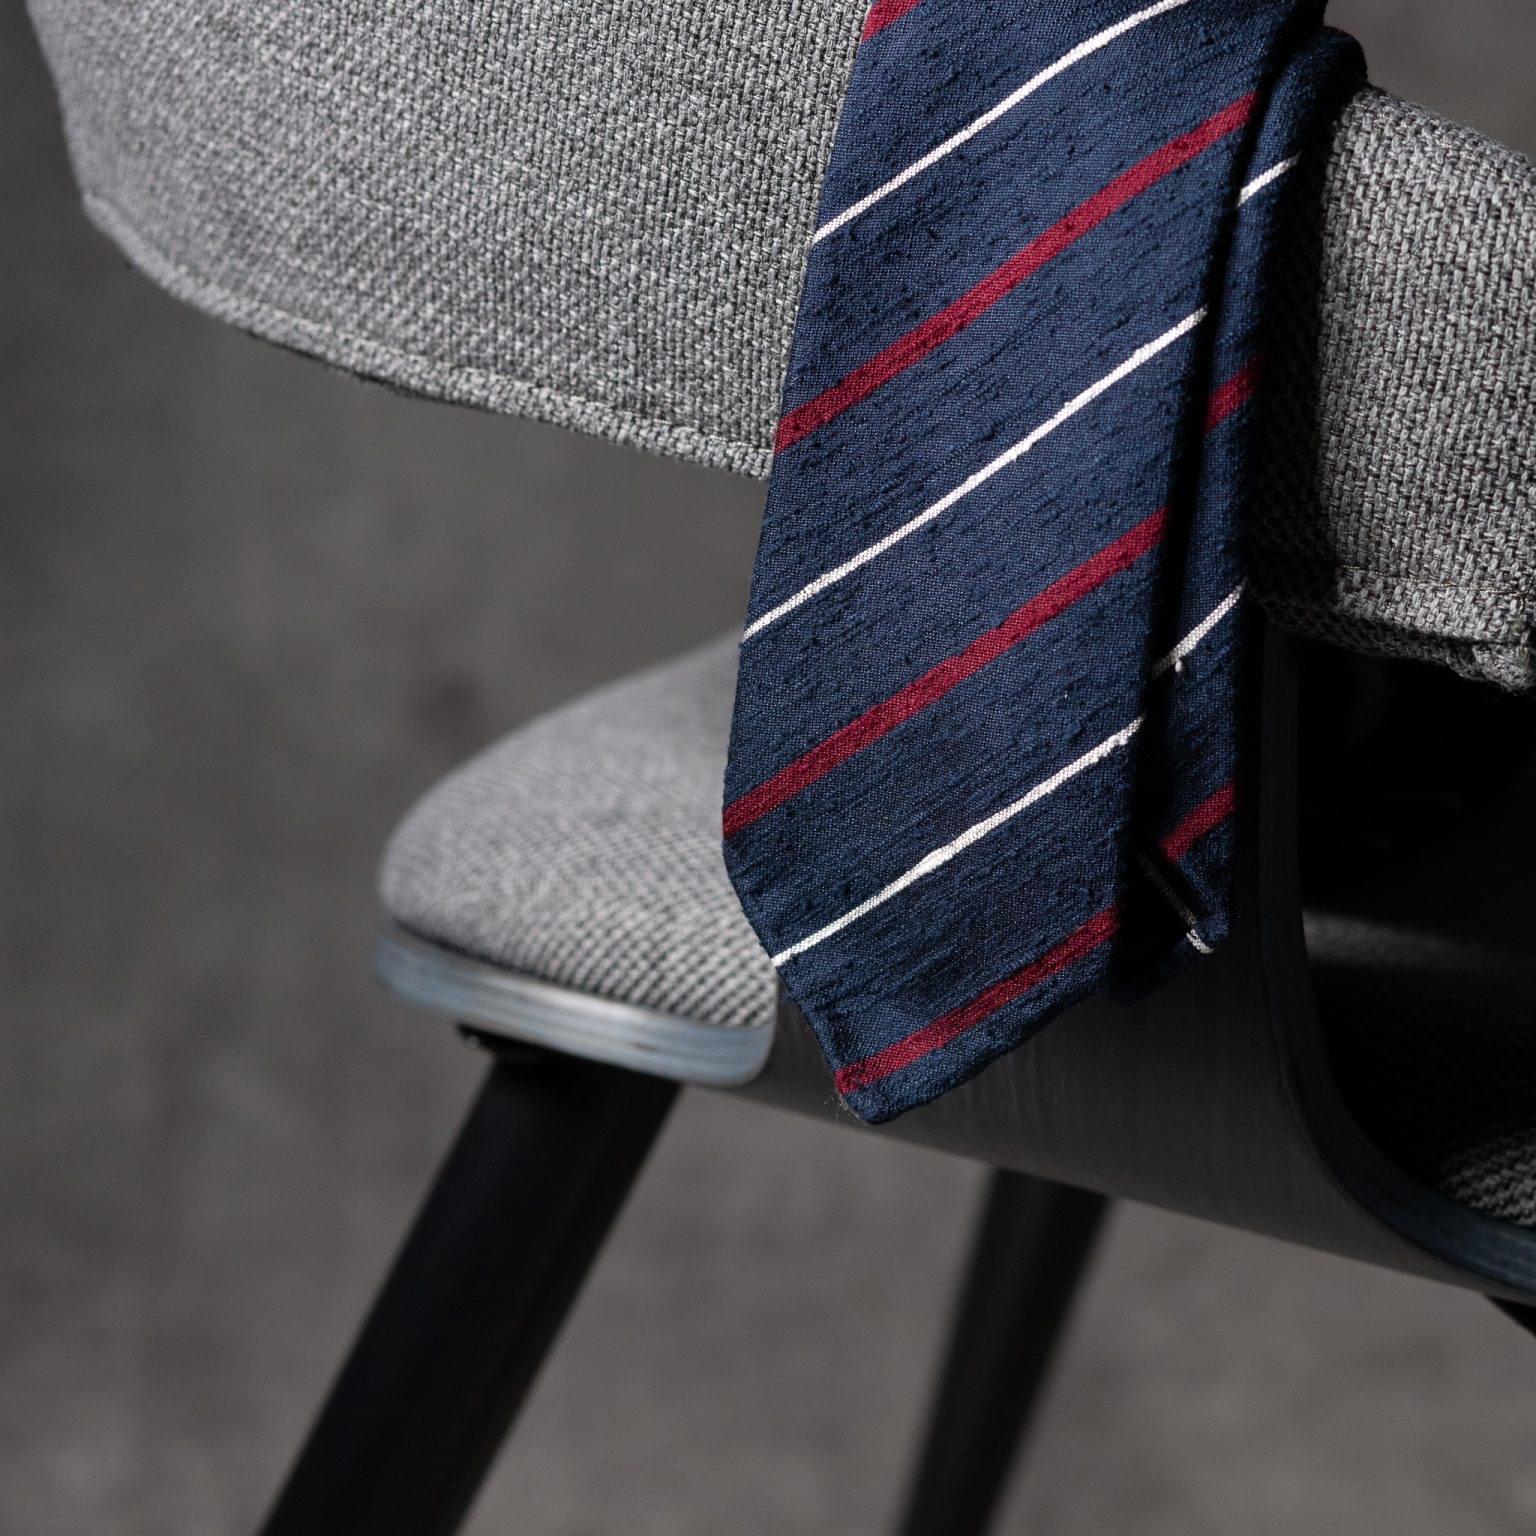 SHANTUNG-0525-Tie-Initials-Corbata-Iniciales-The-Seelk-2